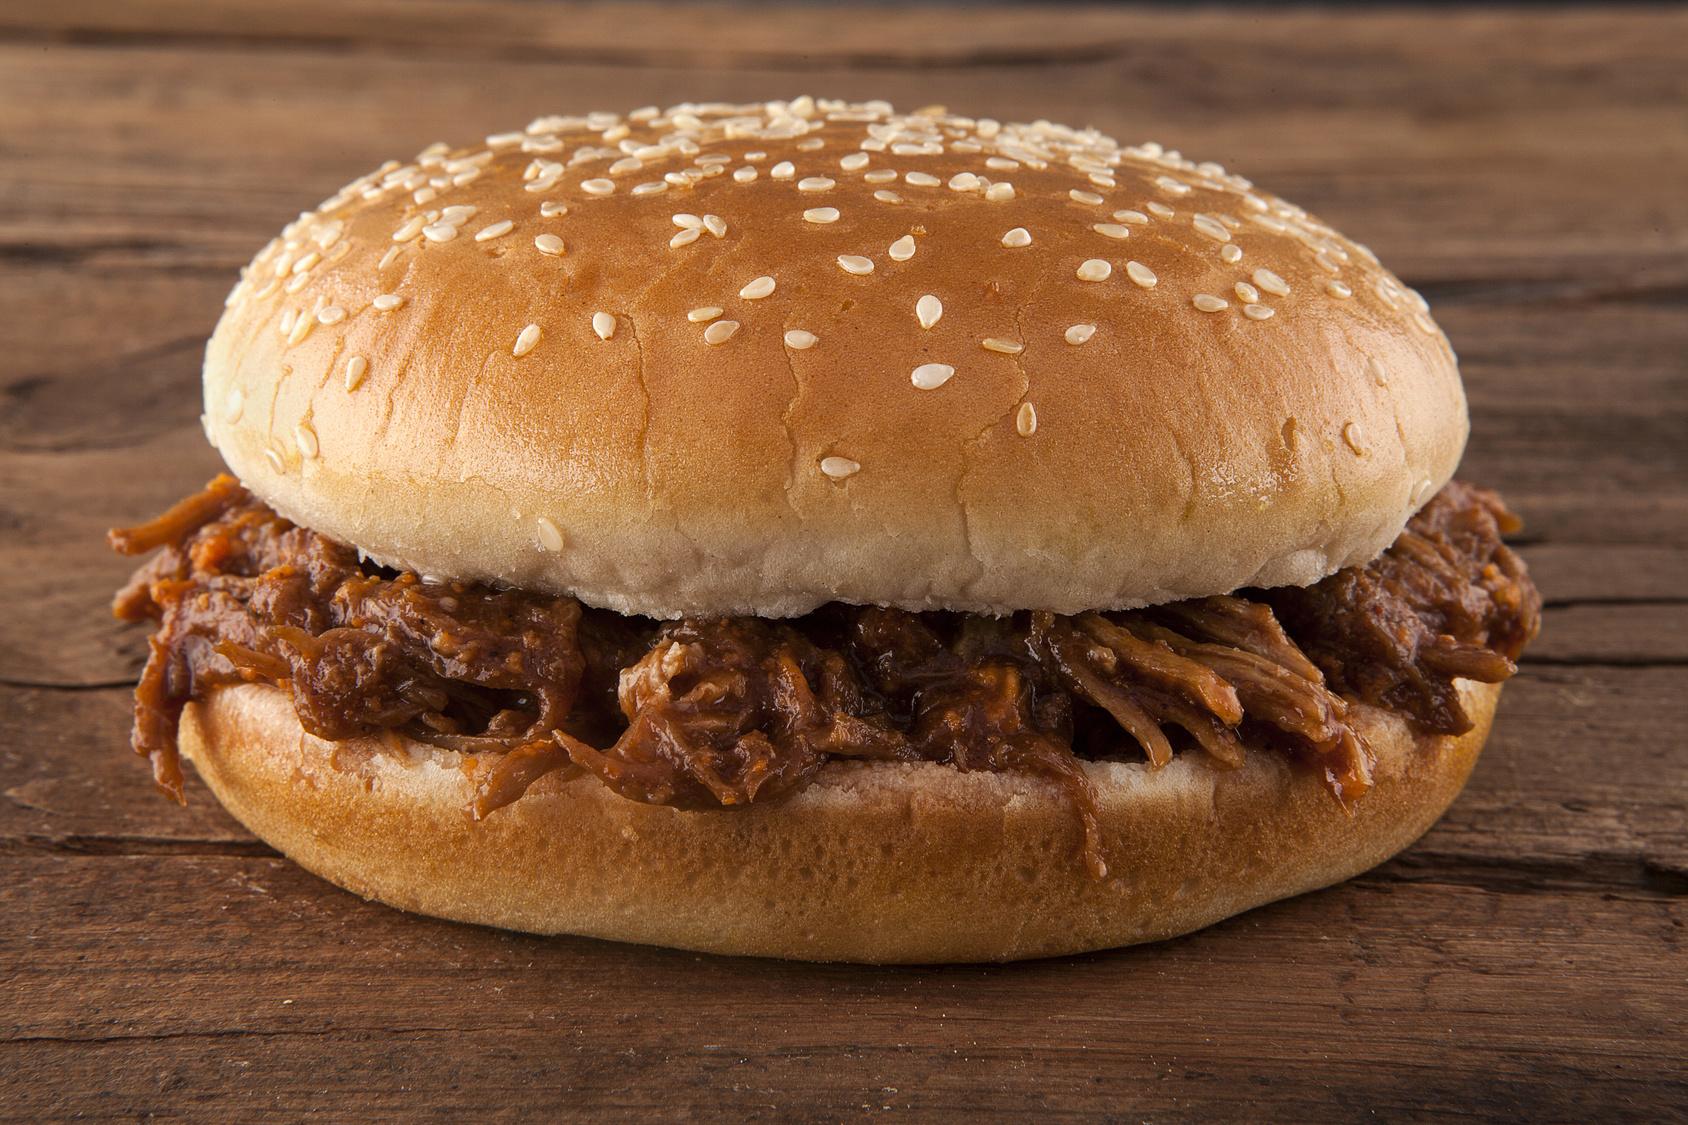 Barbecue Pork with Dan Pastorinis Texas Style Rub